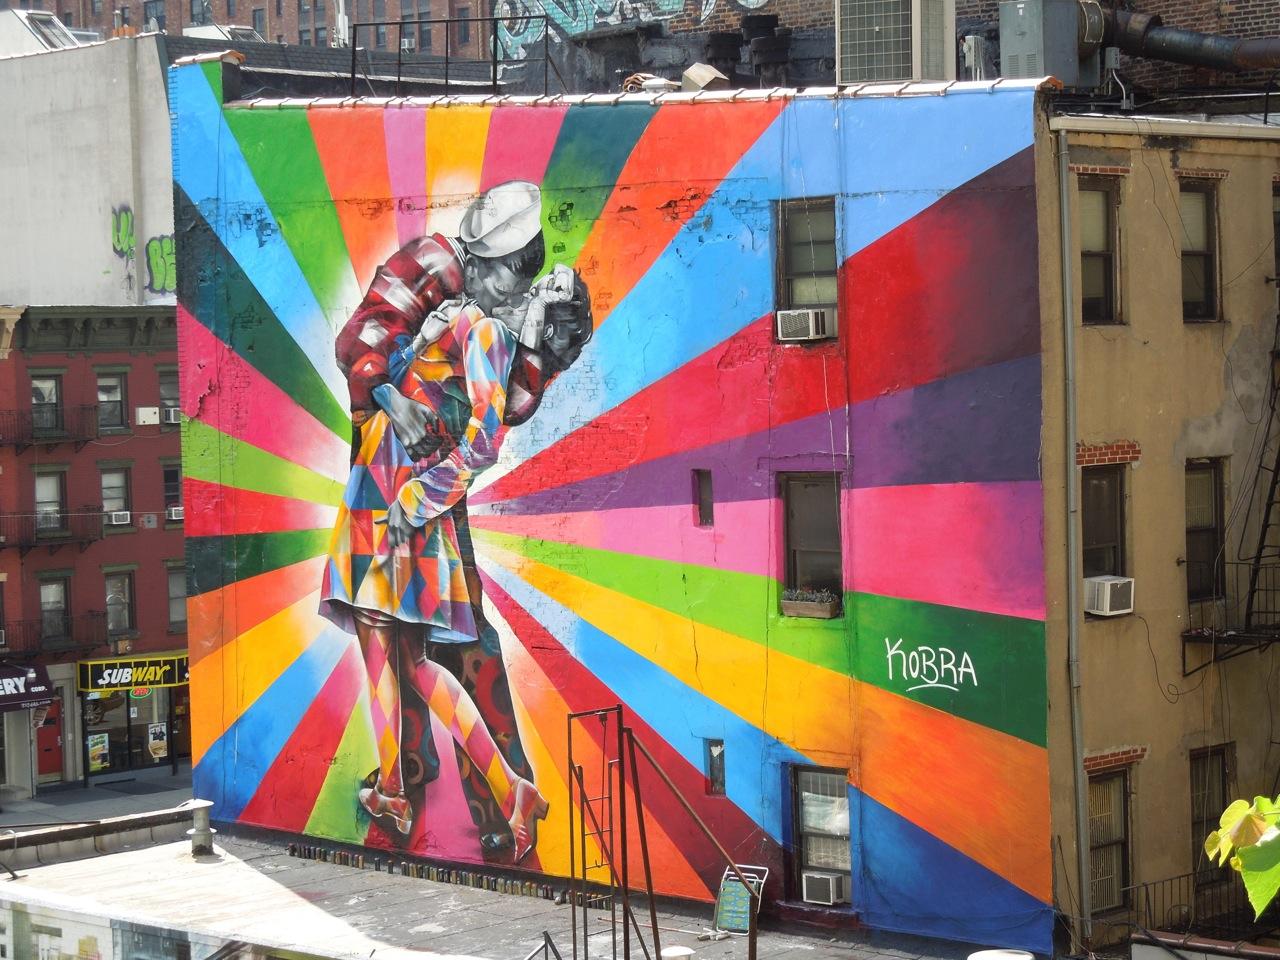 Vj day tribute wall mural eduardo kobra nyc for Building wall mural